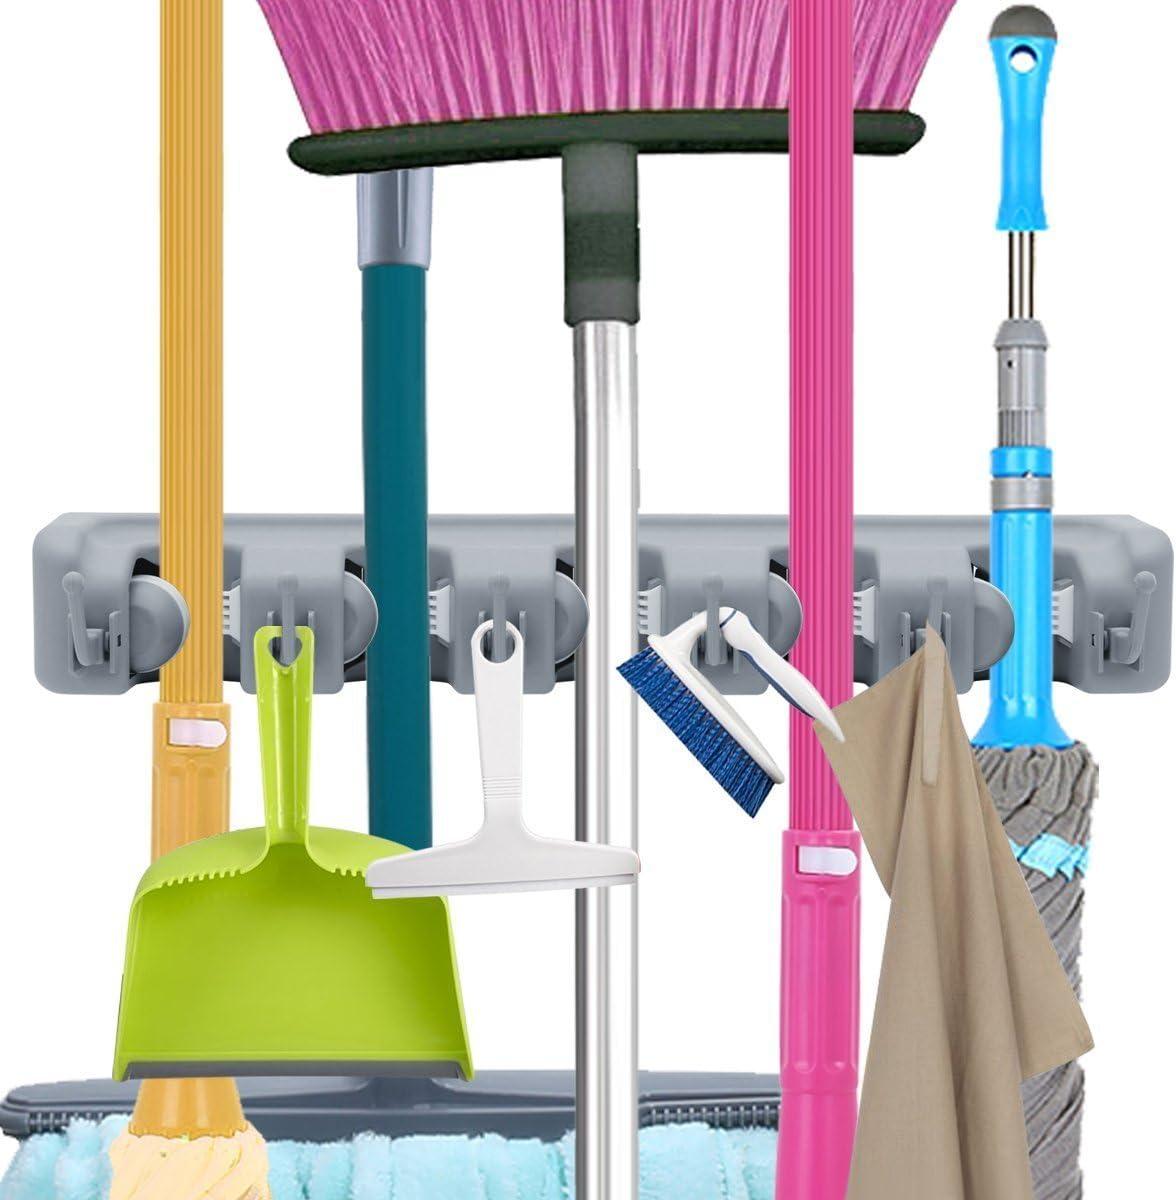 Yevenr Durable Mop Holder Rack Mop Broom Rack Montado en la Pared Mop Broom Holder Mop Broom Holder Rack para el hogar Mop Rack 4 Position 5 Hooks